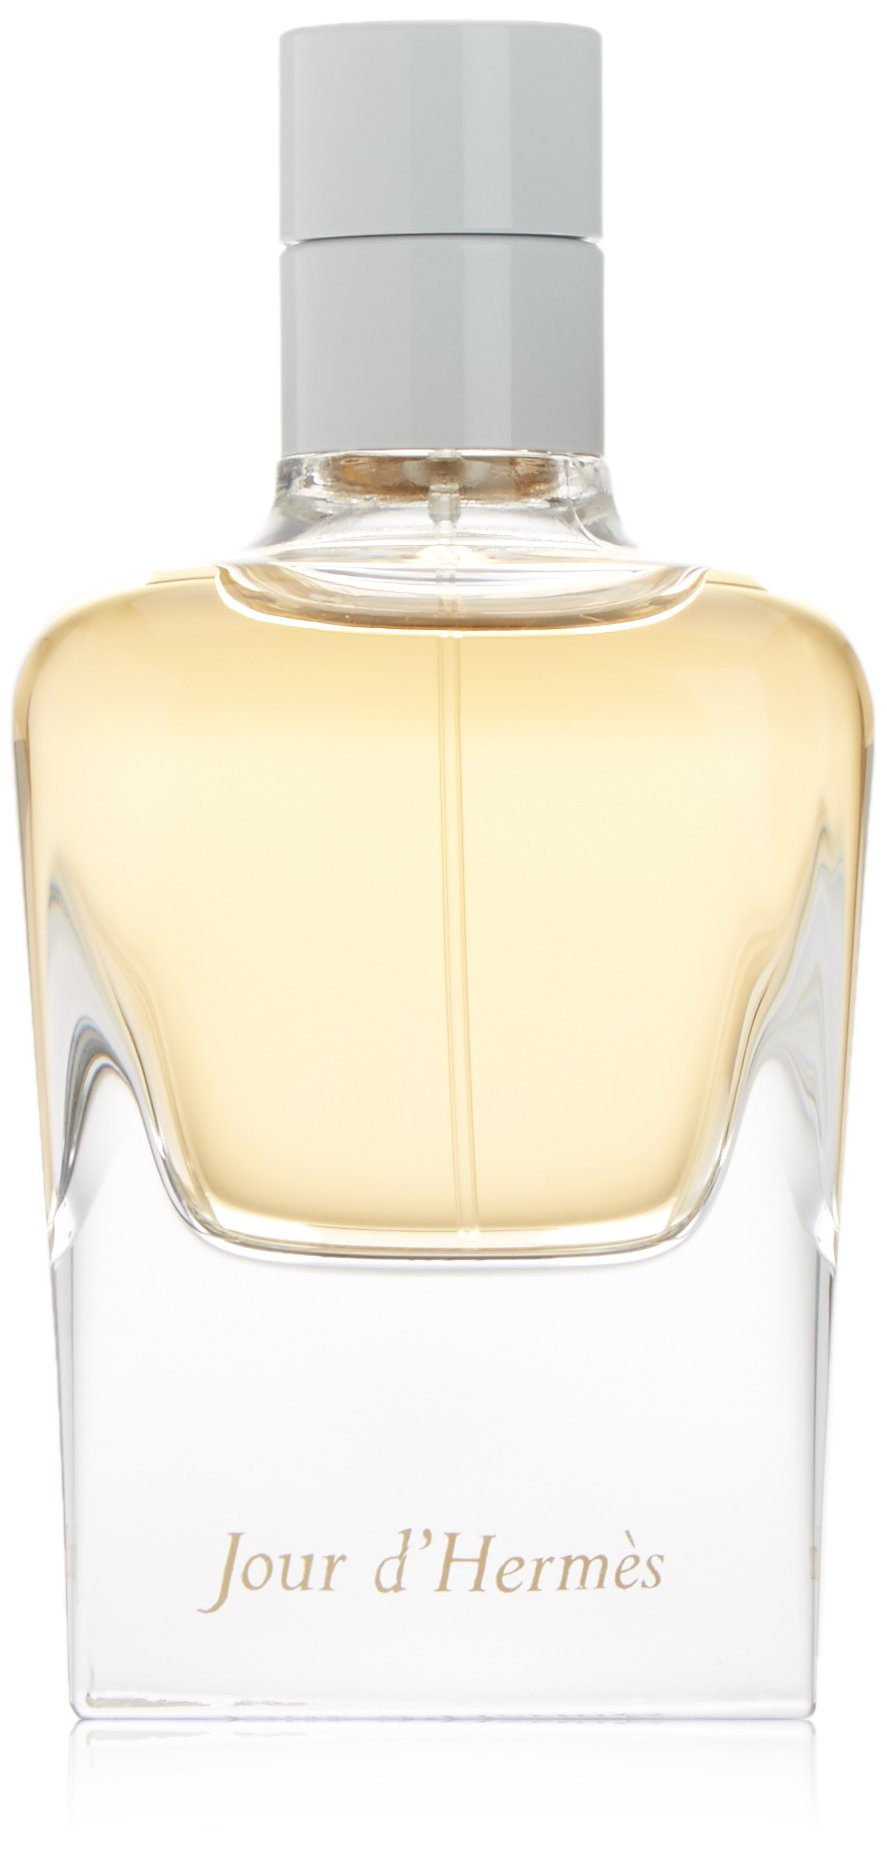 Nước hoa Eau de parfum natural spray 85ml của Jour d'Hermes dành cho Nữ